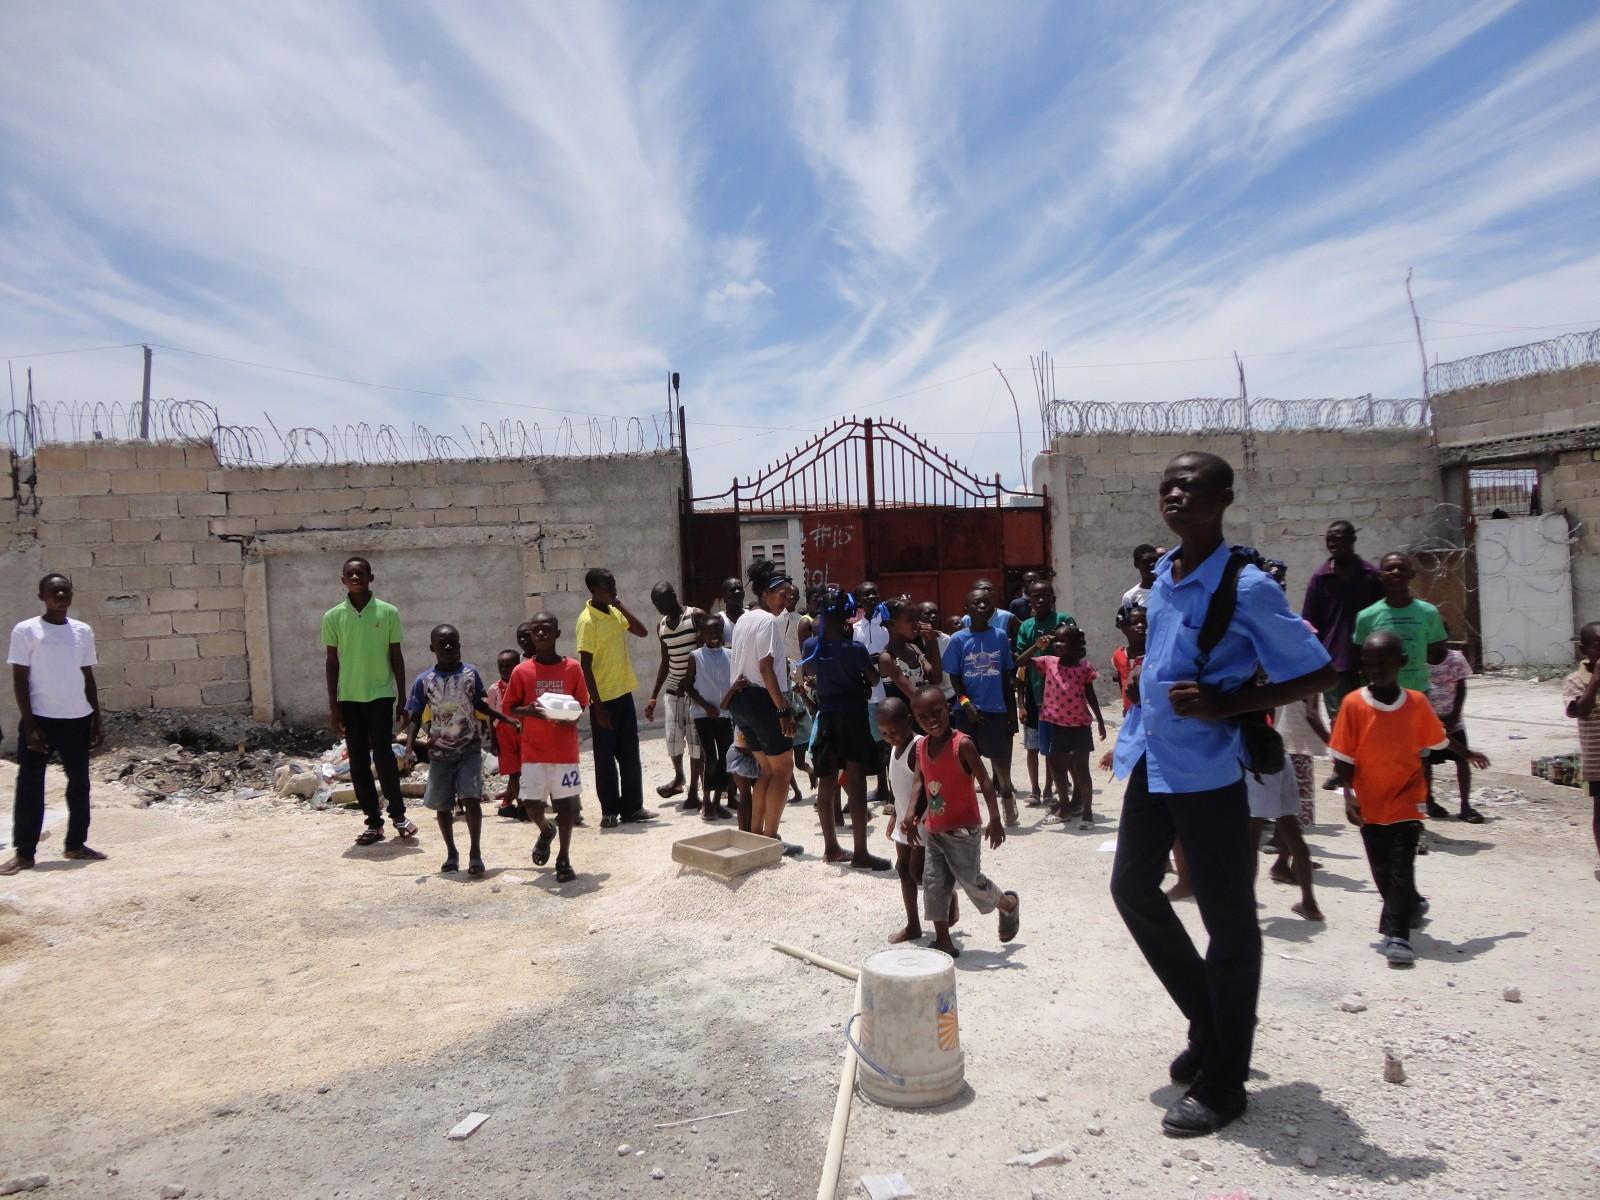 2013, Haiti, Cité Soleil, TWA, Third World Awareness, charity, non-profit, school, education, kids, Haitian, children, schoolyard, volunteers